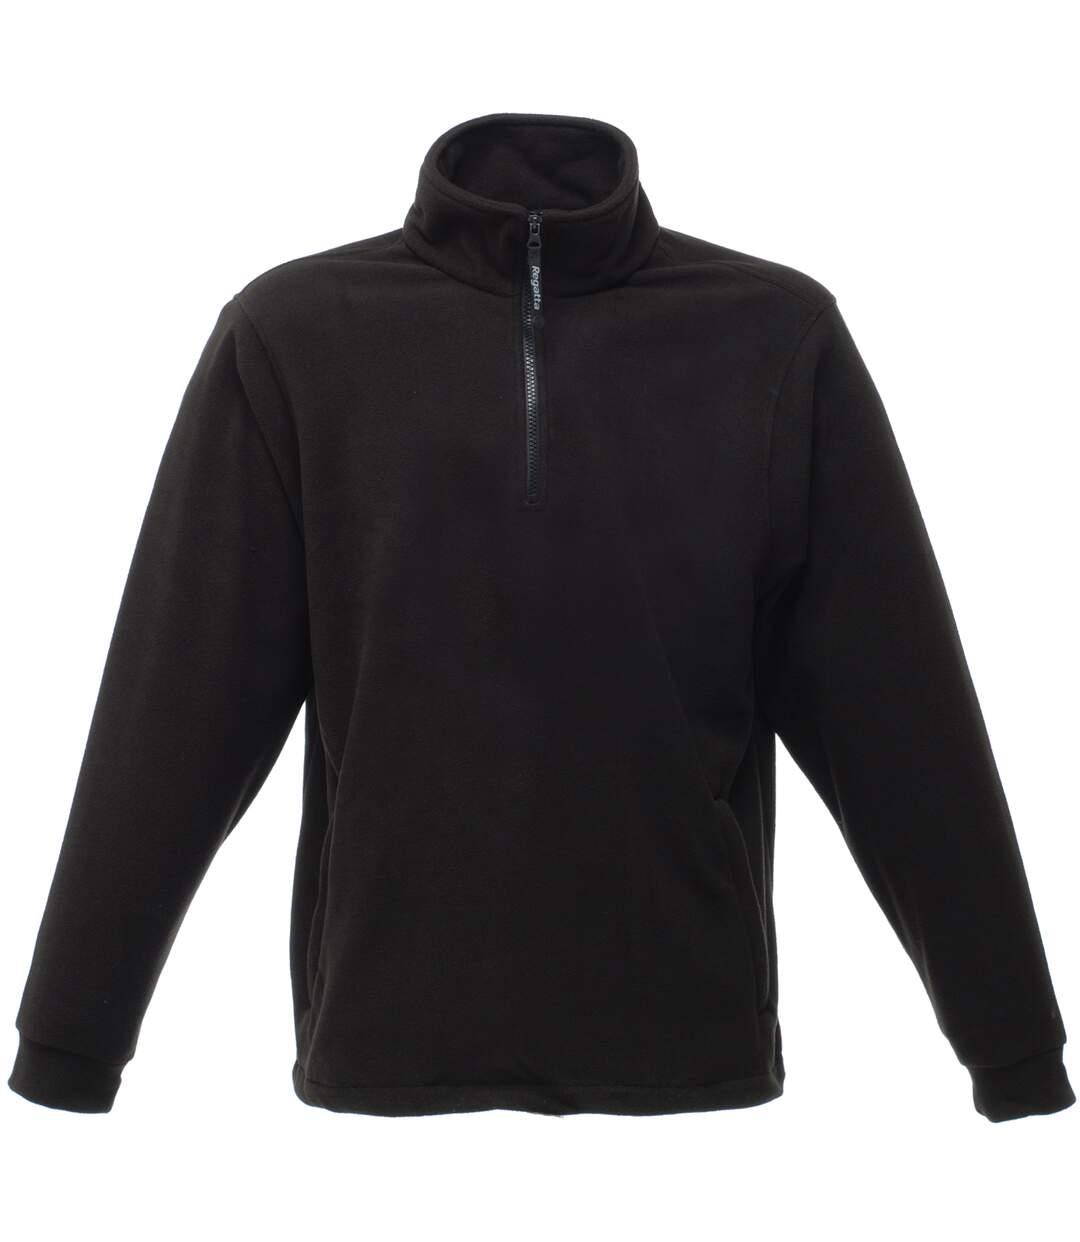 Regatta Mens Thor Overhead Anti-Pill Fleece Top (Black) - UTRW1196